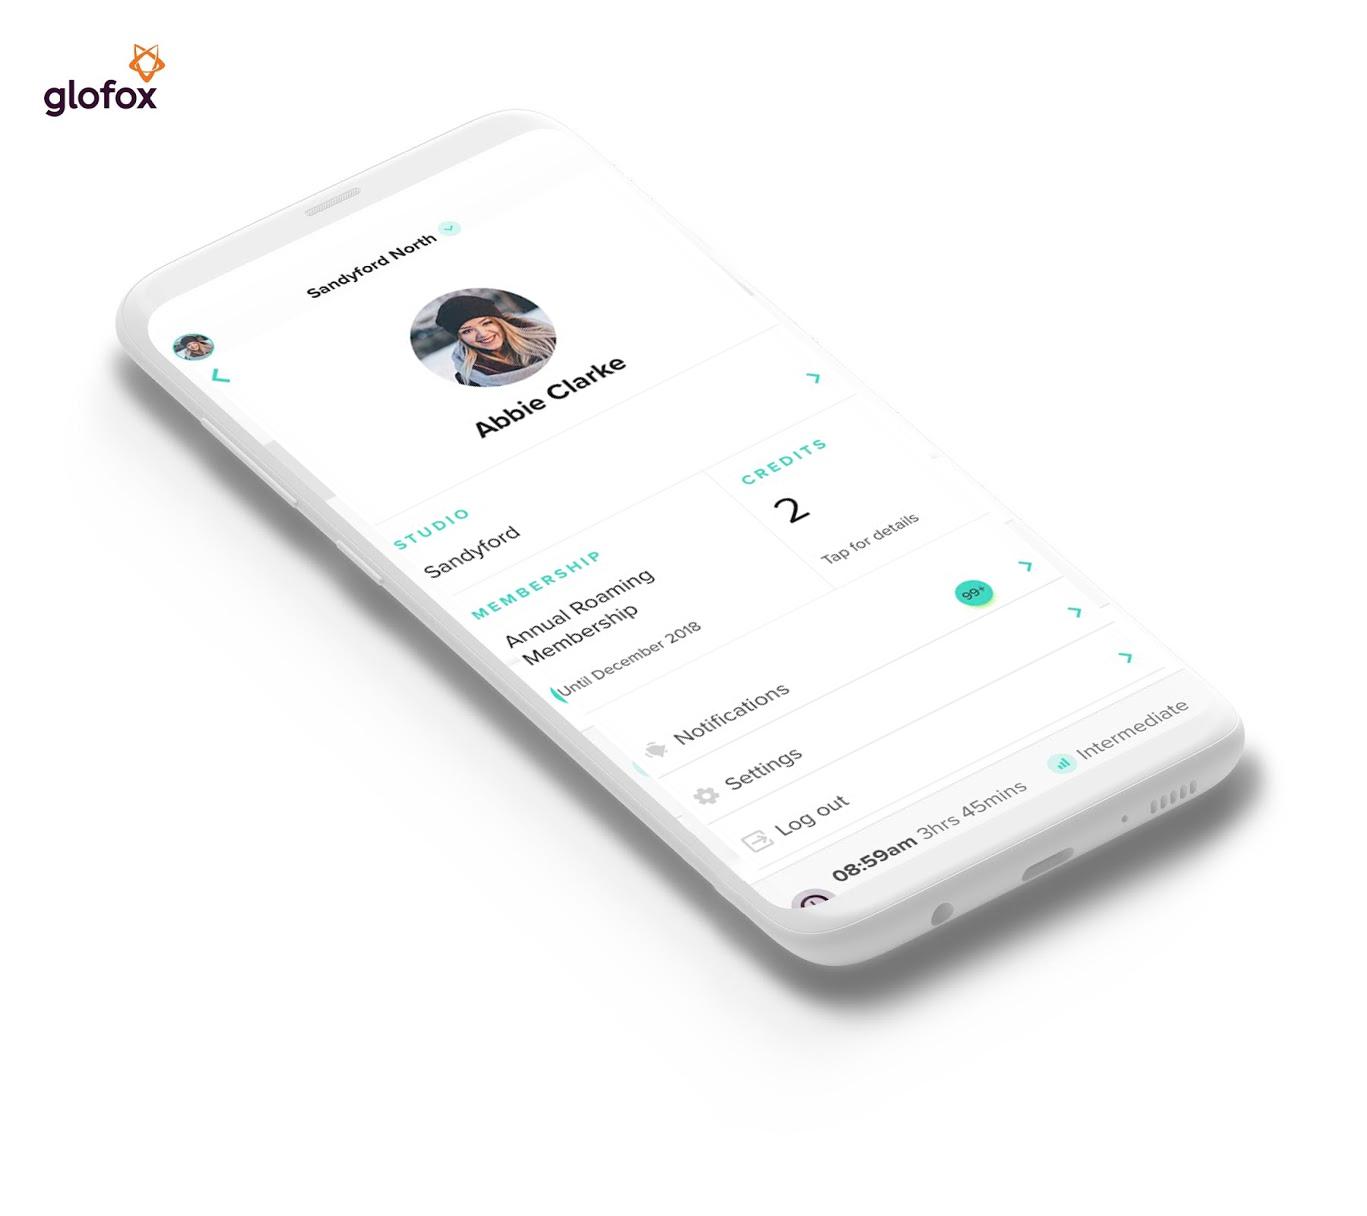 glofox app